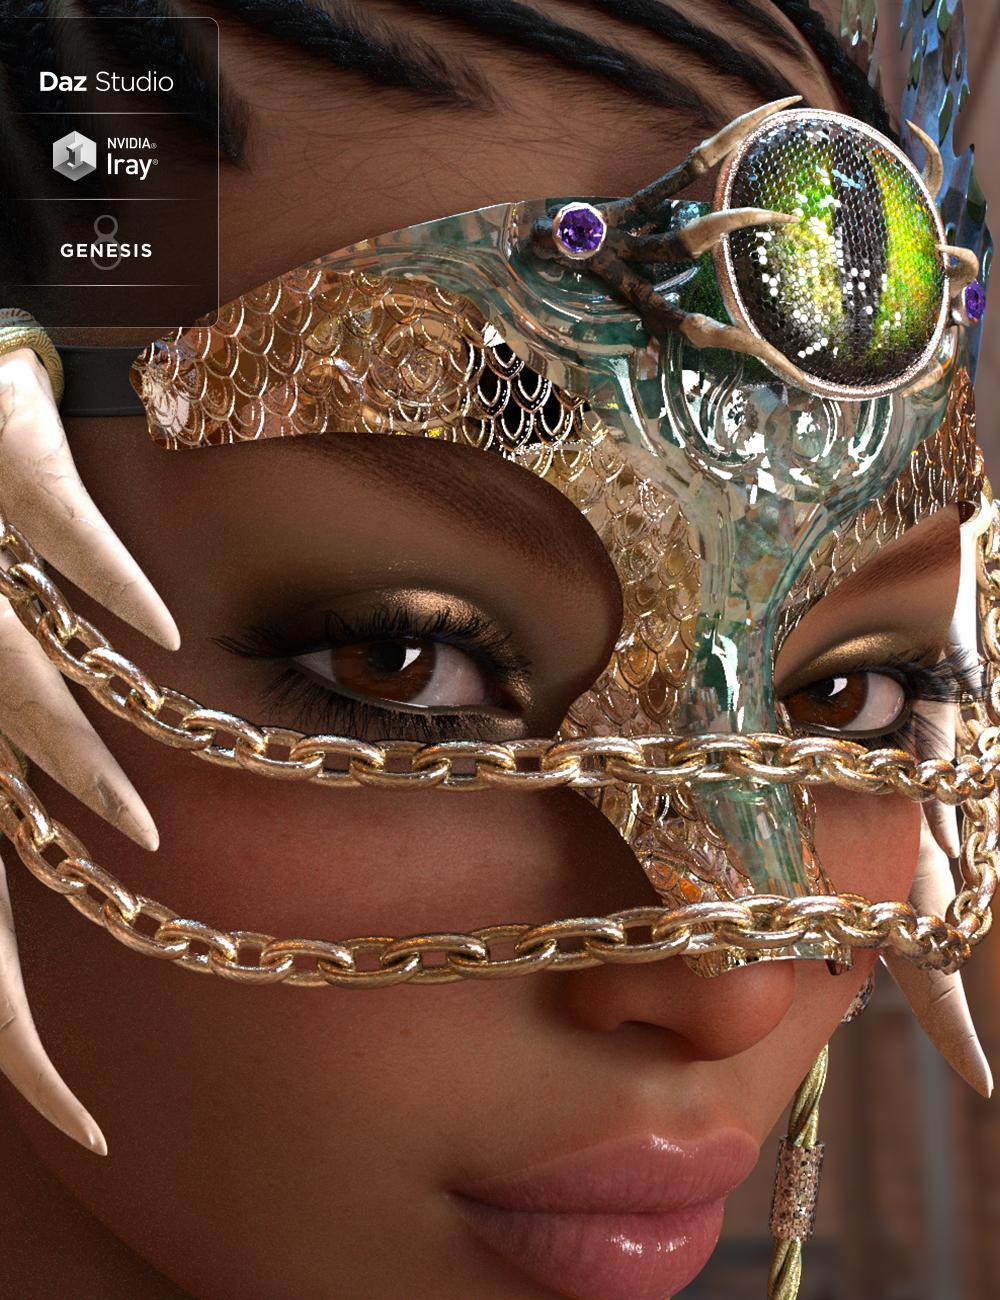 Elaborate Jewelry Vol 2 by: ParallaxCreatesParallaxCreates, 3D Models by Daz 3D